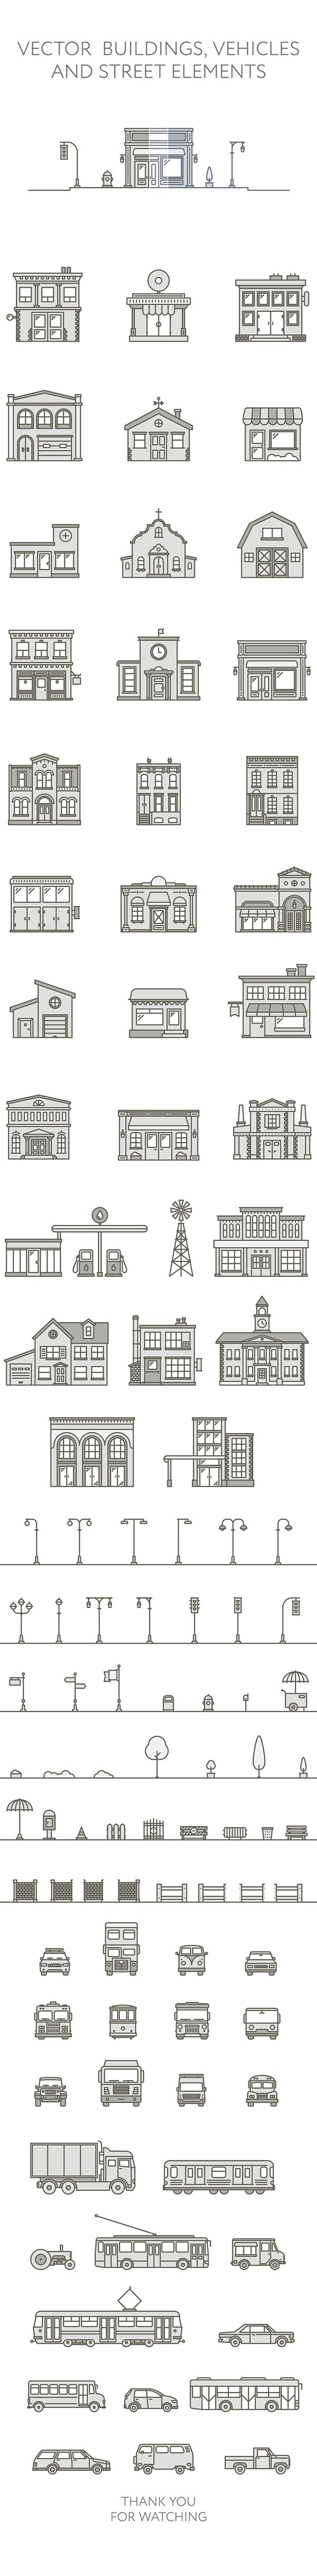 Vector buildings vehicles and street elements building illustration flat line design also patterns rh pinterest